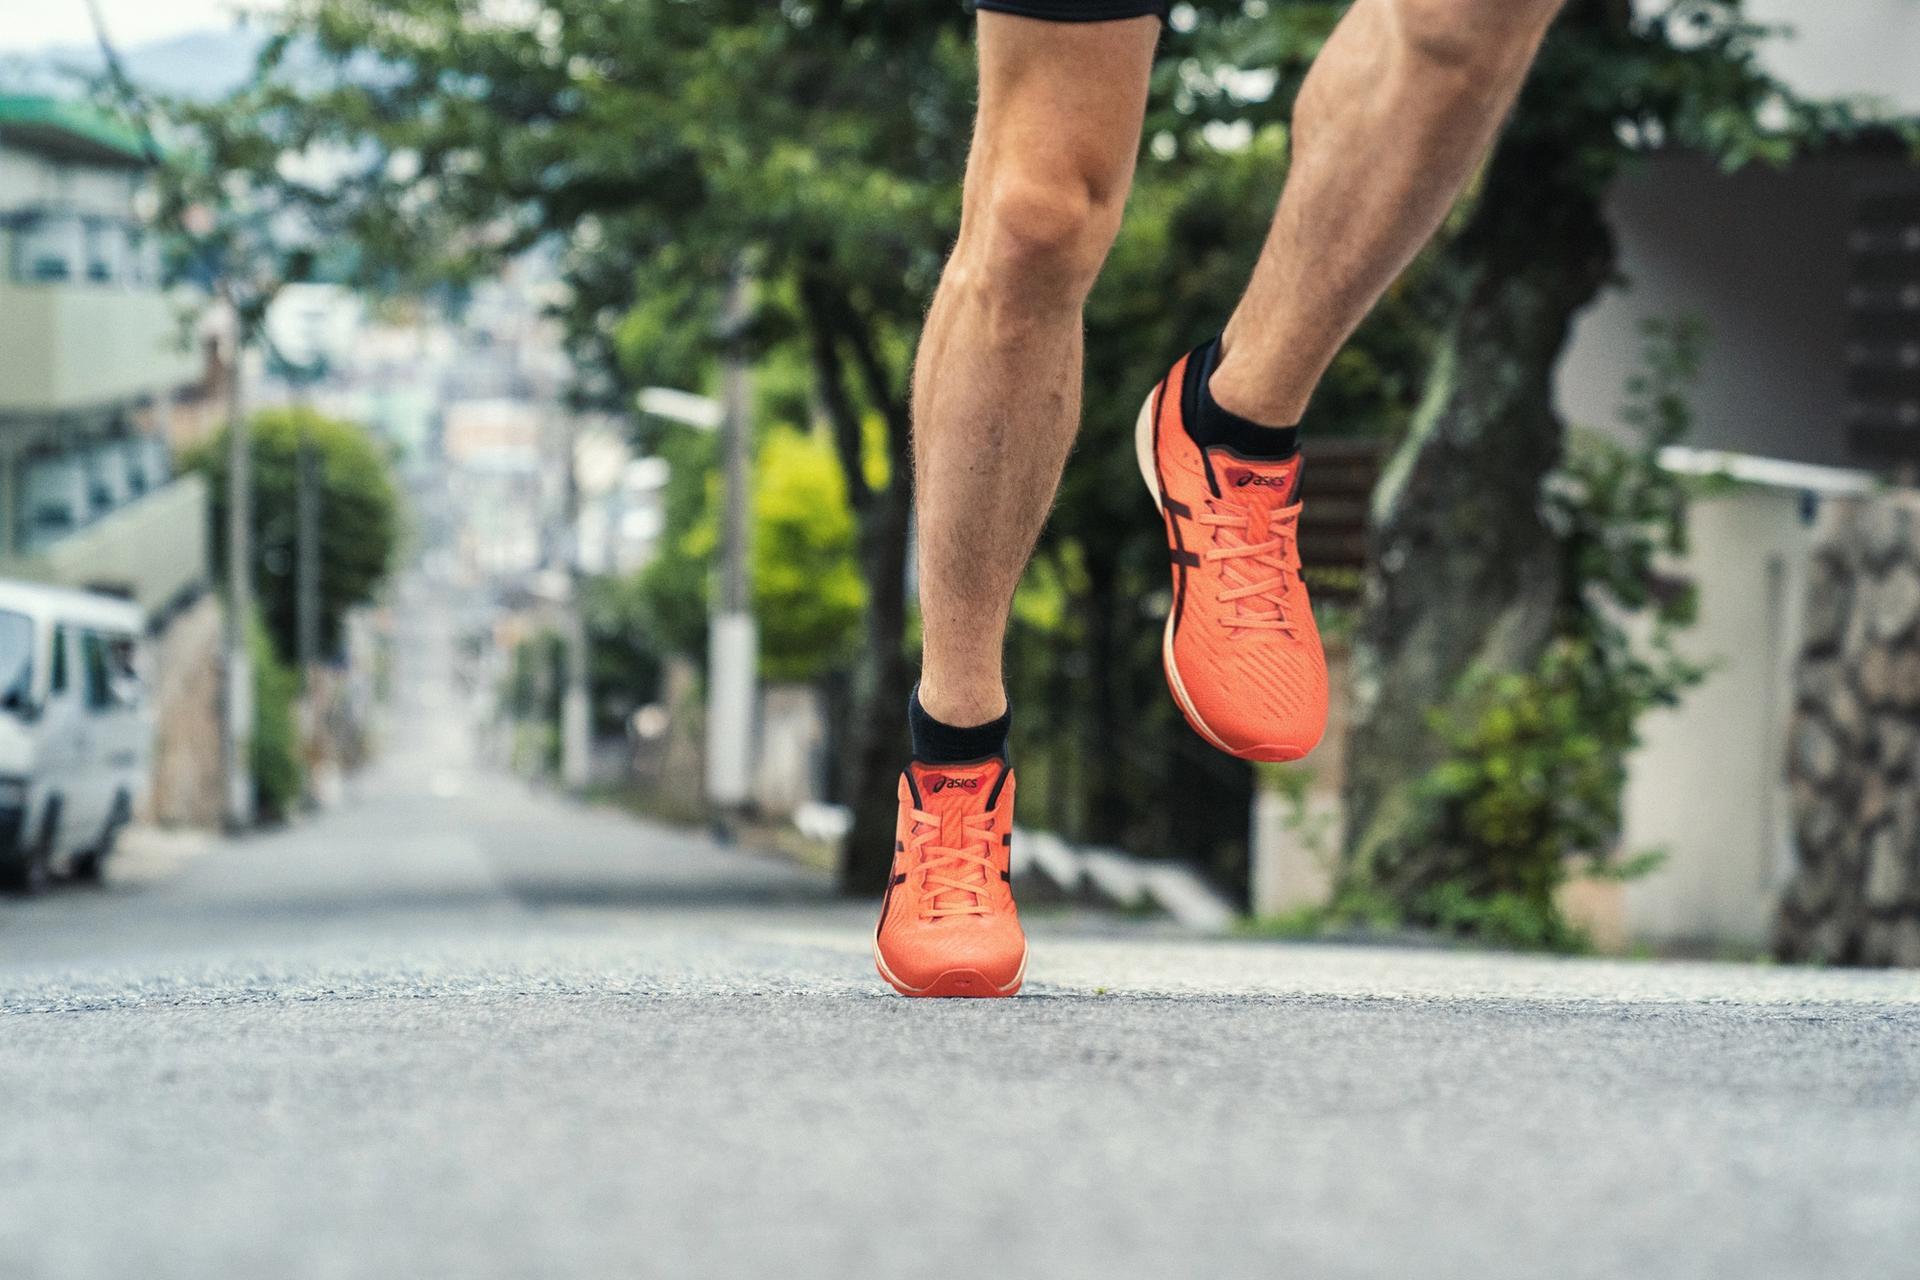 Løper på asfalt med Metaracer